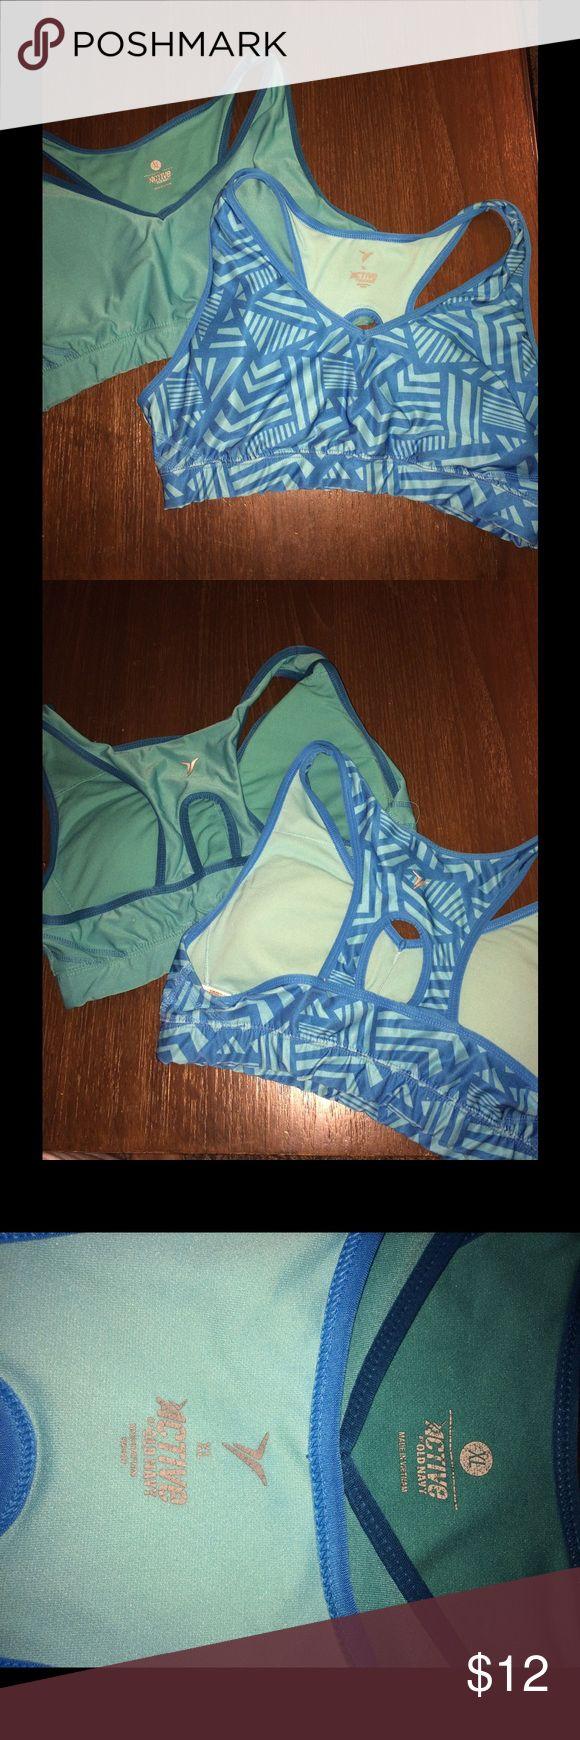 2 Old Navy Sports Bras 2 Old Navy sports bras size XL. Good condition. Smoke free home. Old Navy Intimates & Sleepwear Bras